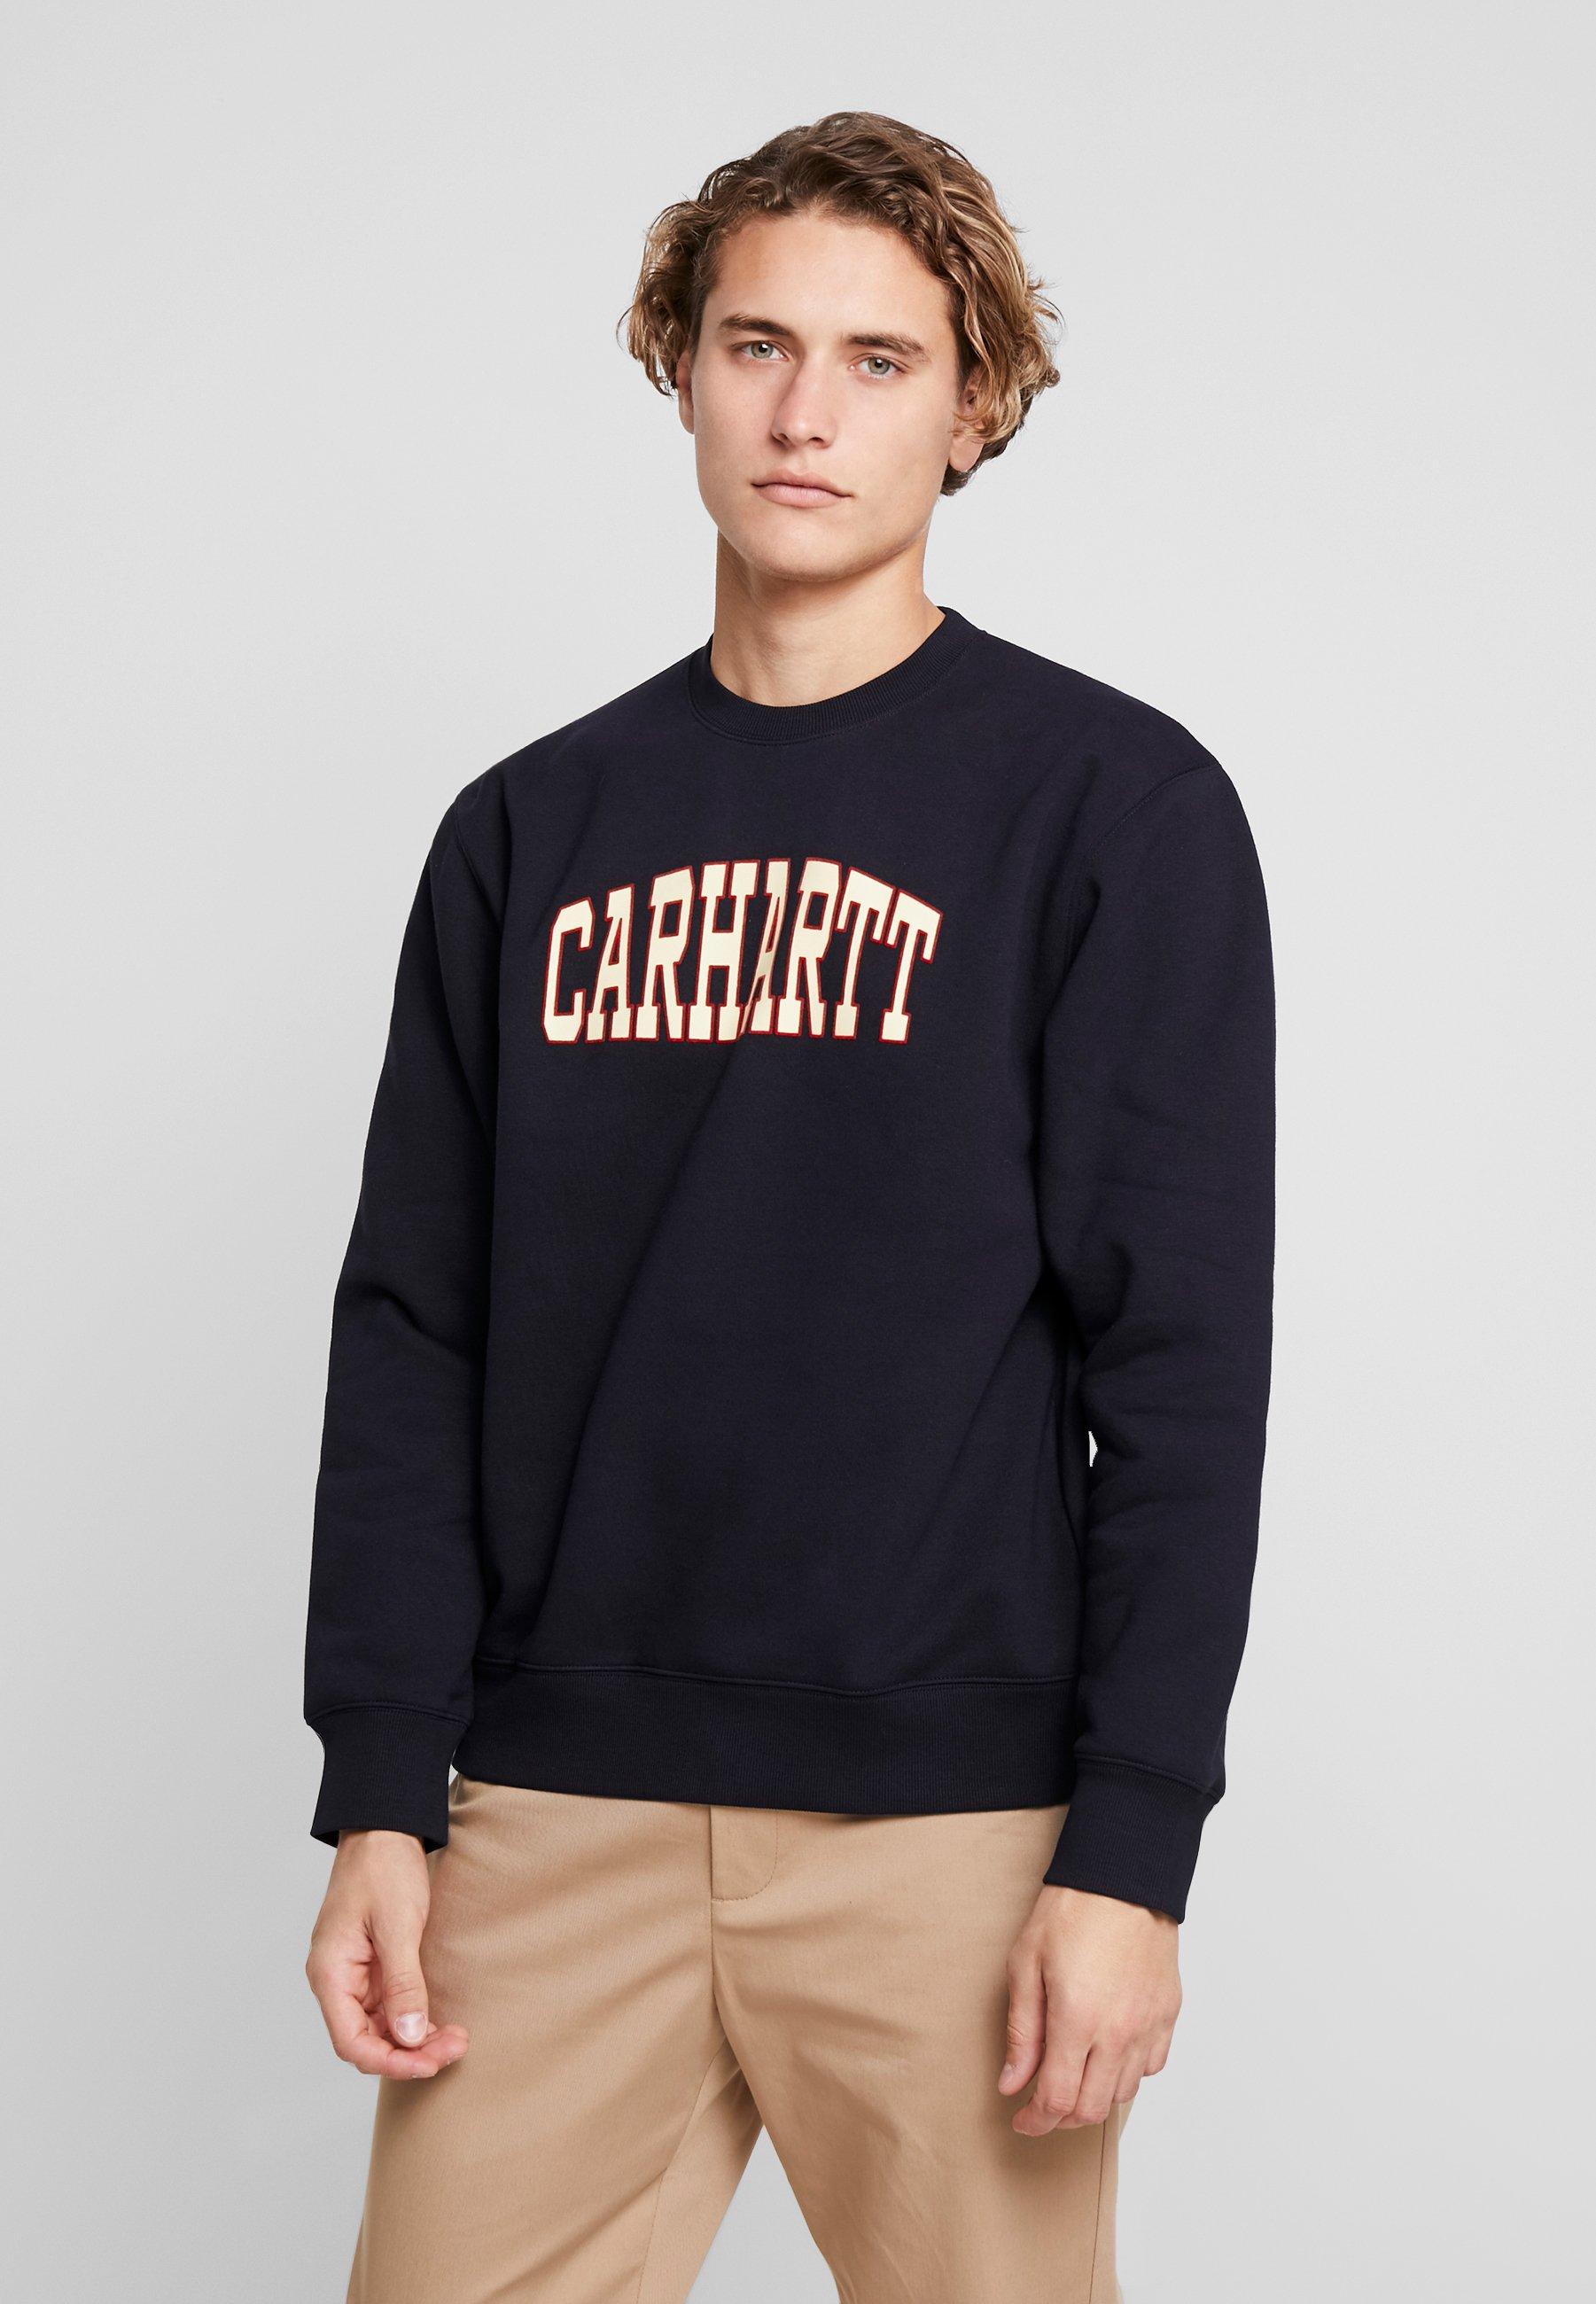 TheorySweatshirt Carhartt Wip Carhartt Dark Wip TheorySweatshirt Navy tQrhsdCxB